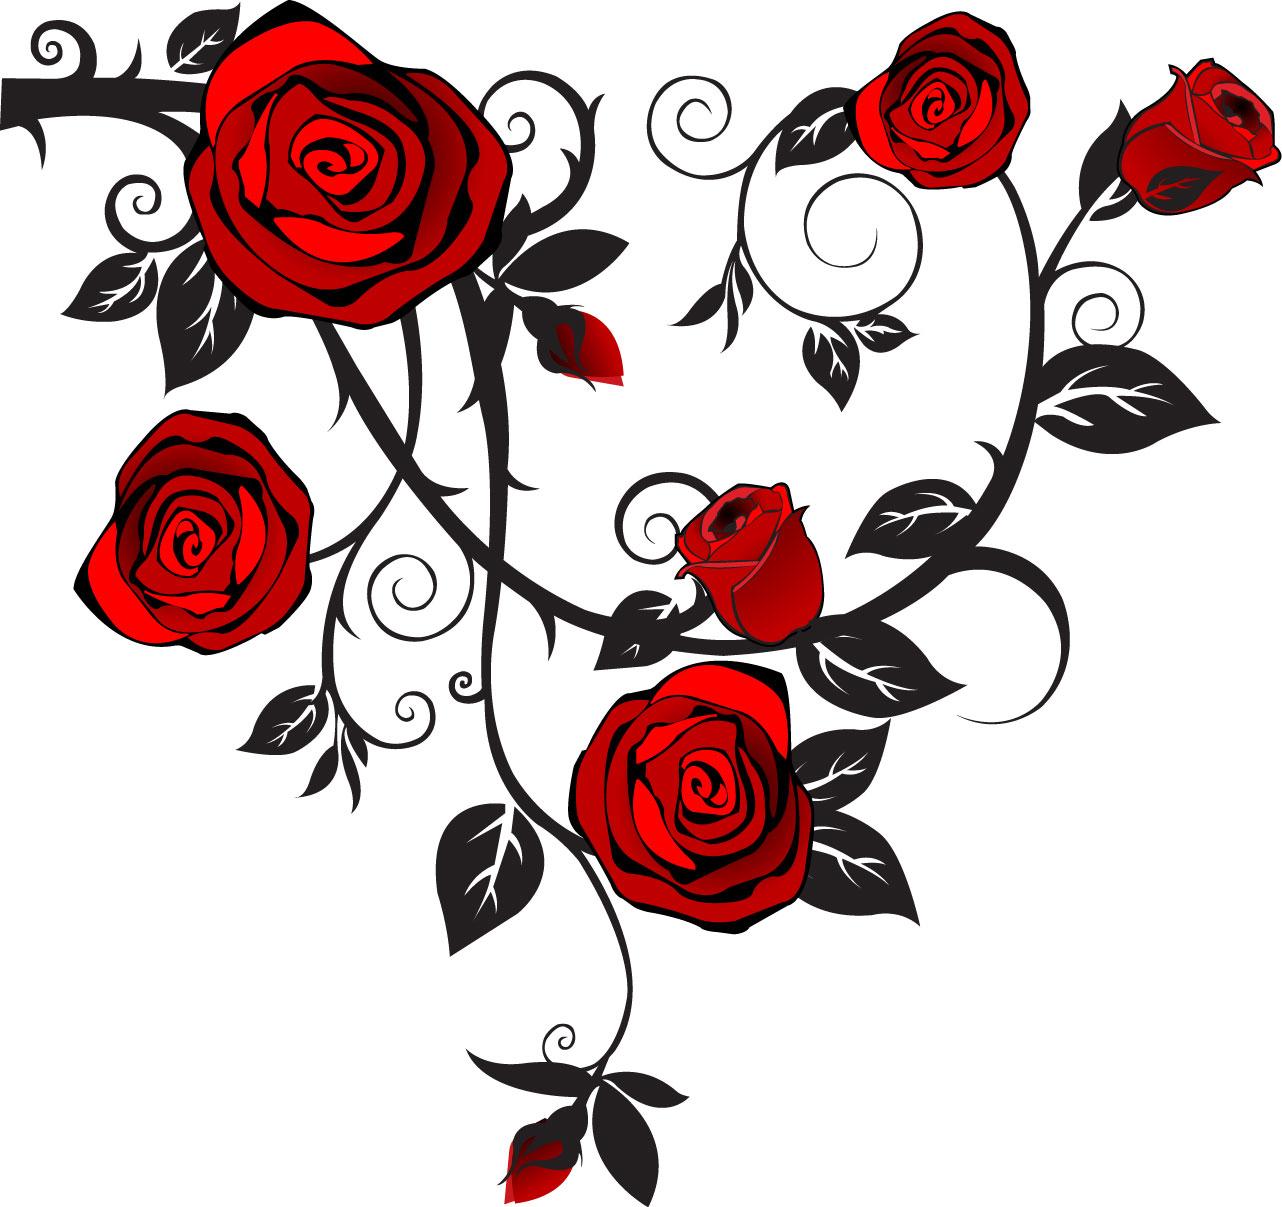 Rosevine clipart vector transparent stock Rose Vine Clip Art free image vector transparent stock